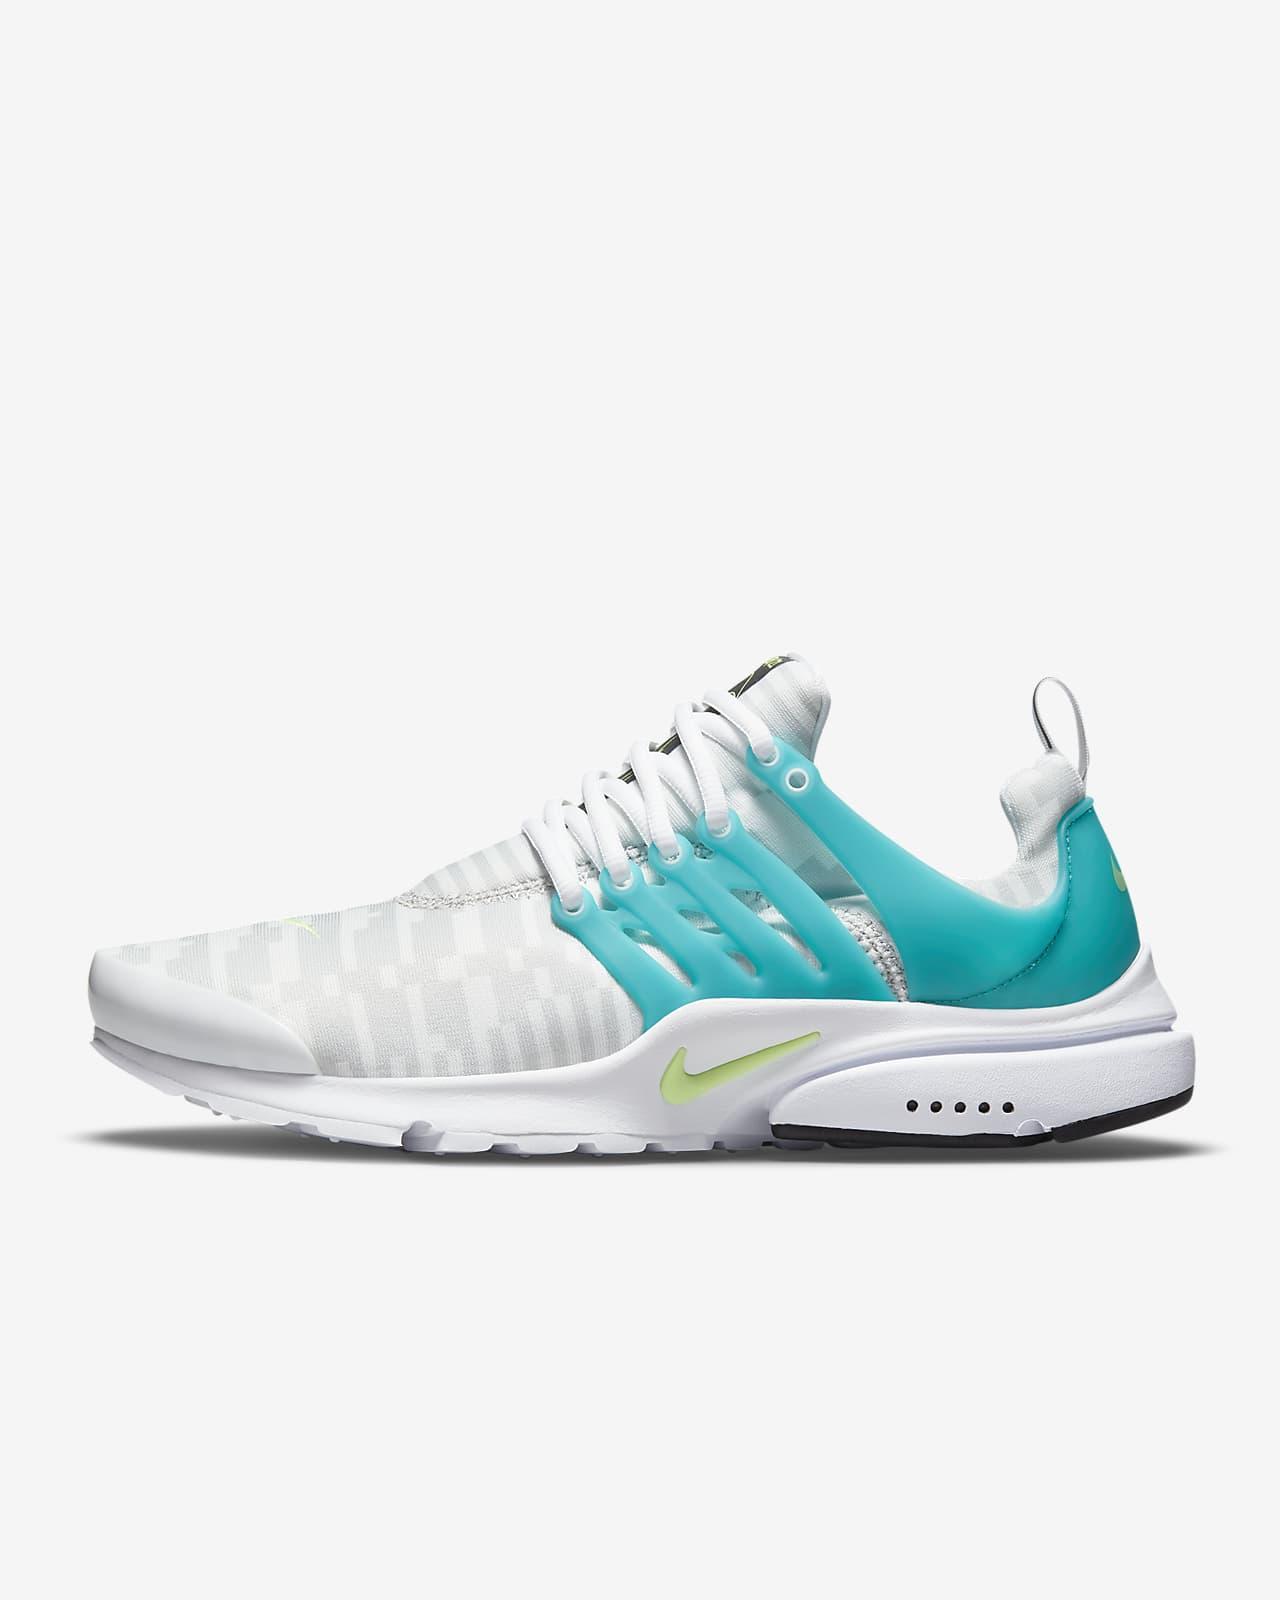 Nike Air Presto Shoe